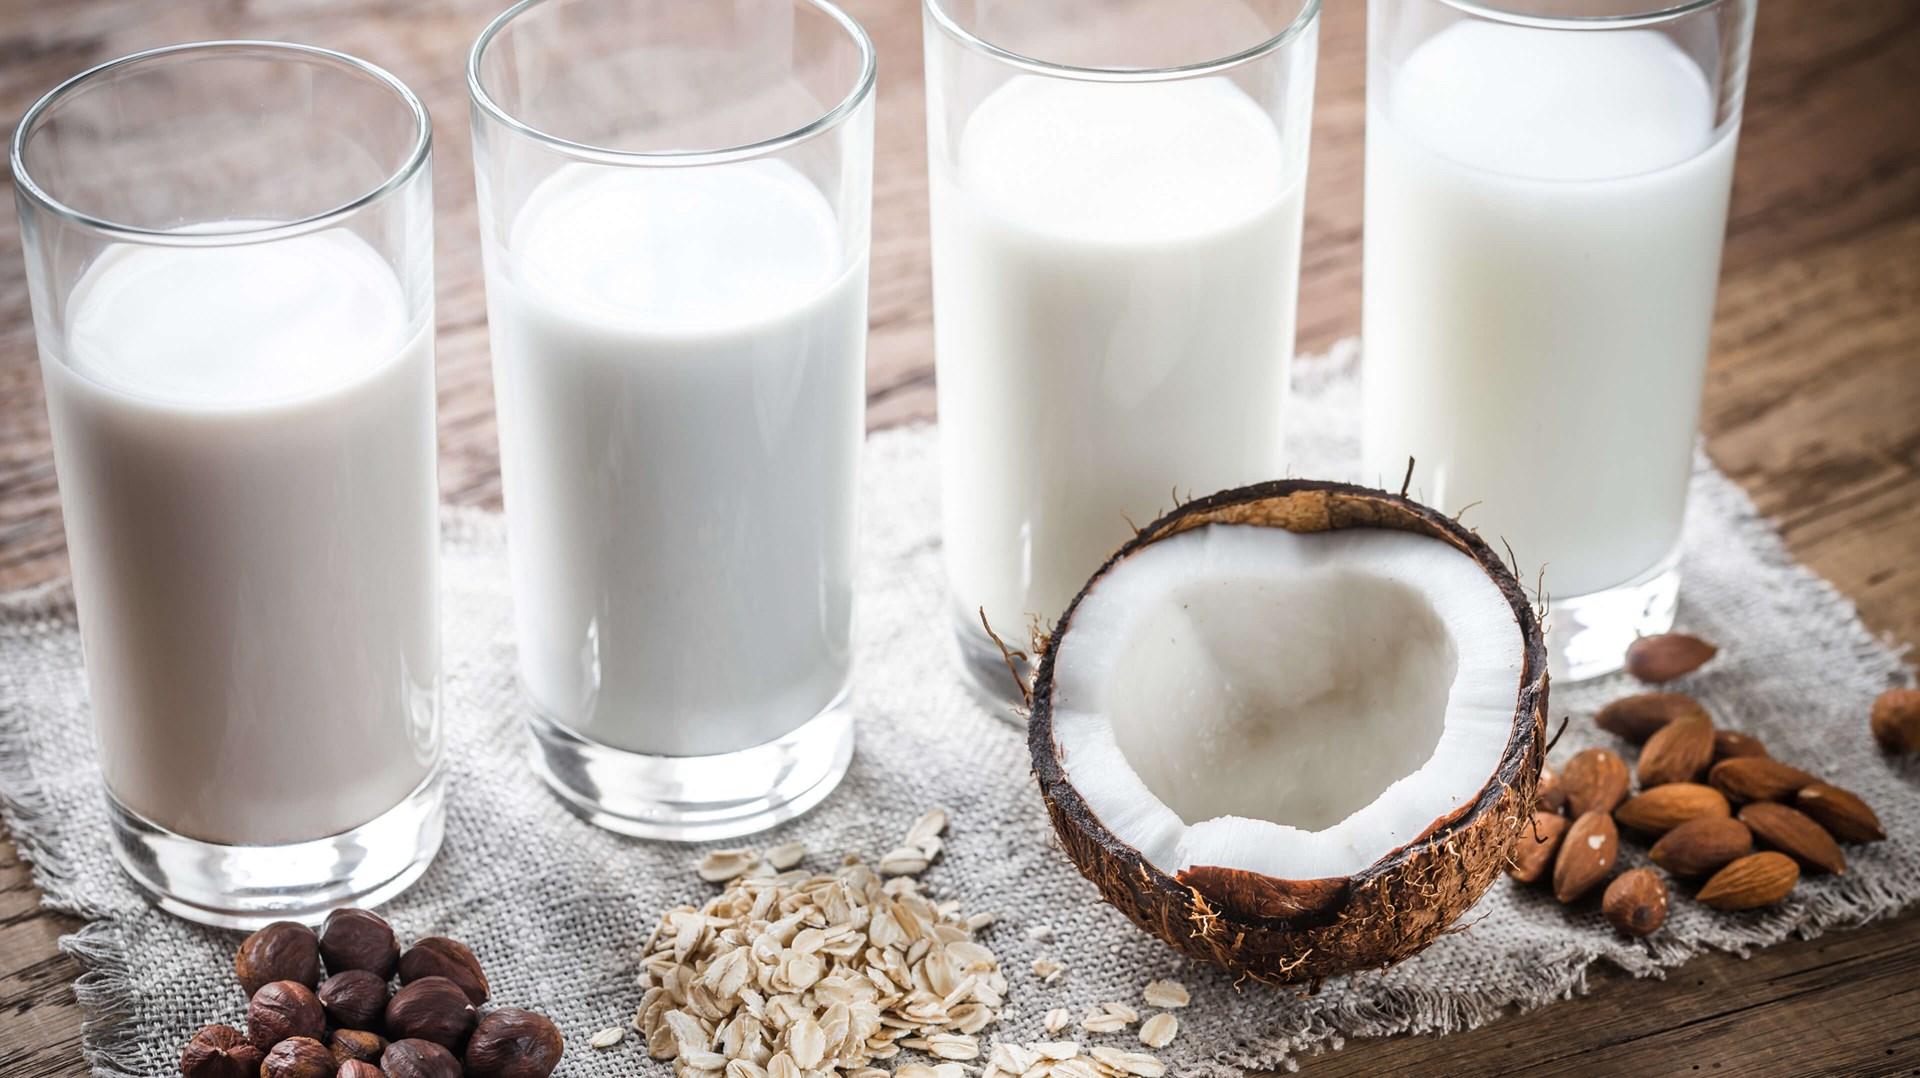 Vegan Drinks Made With Palsgaard Recmilk